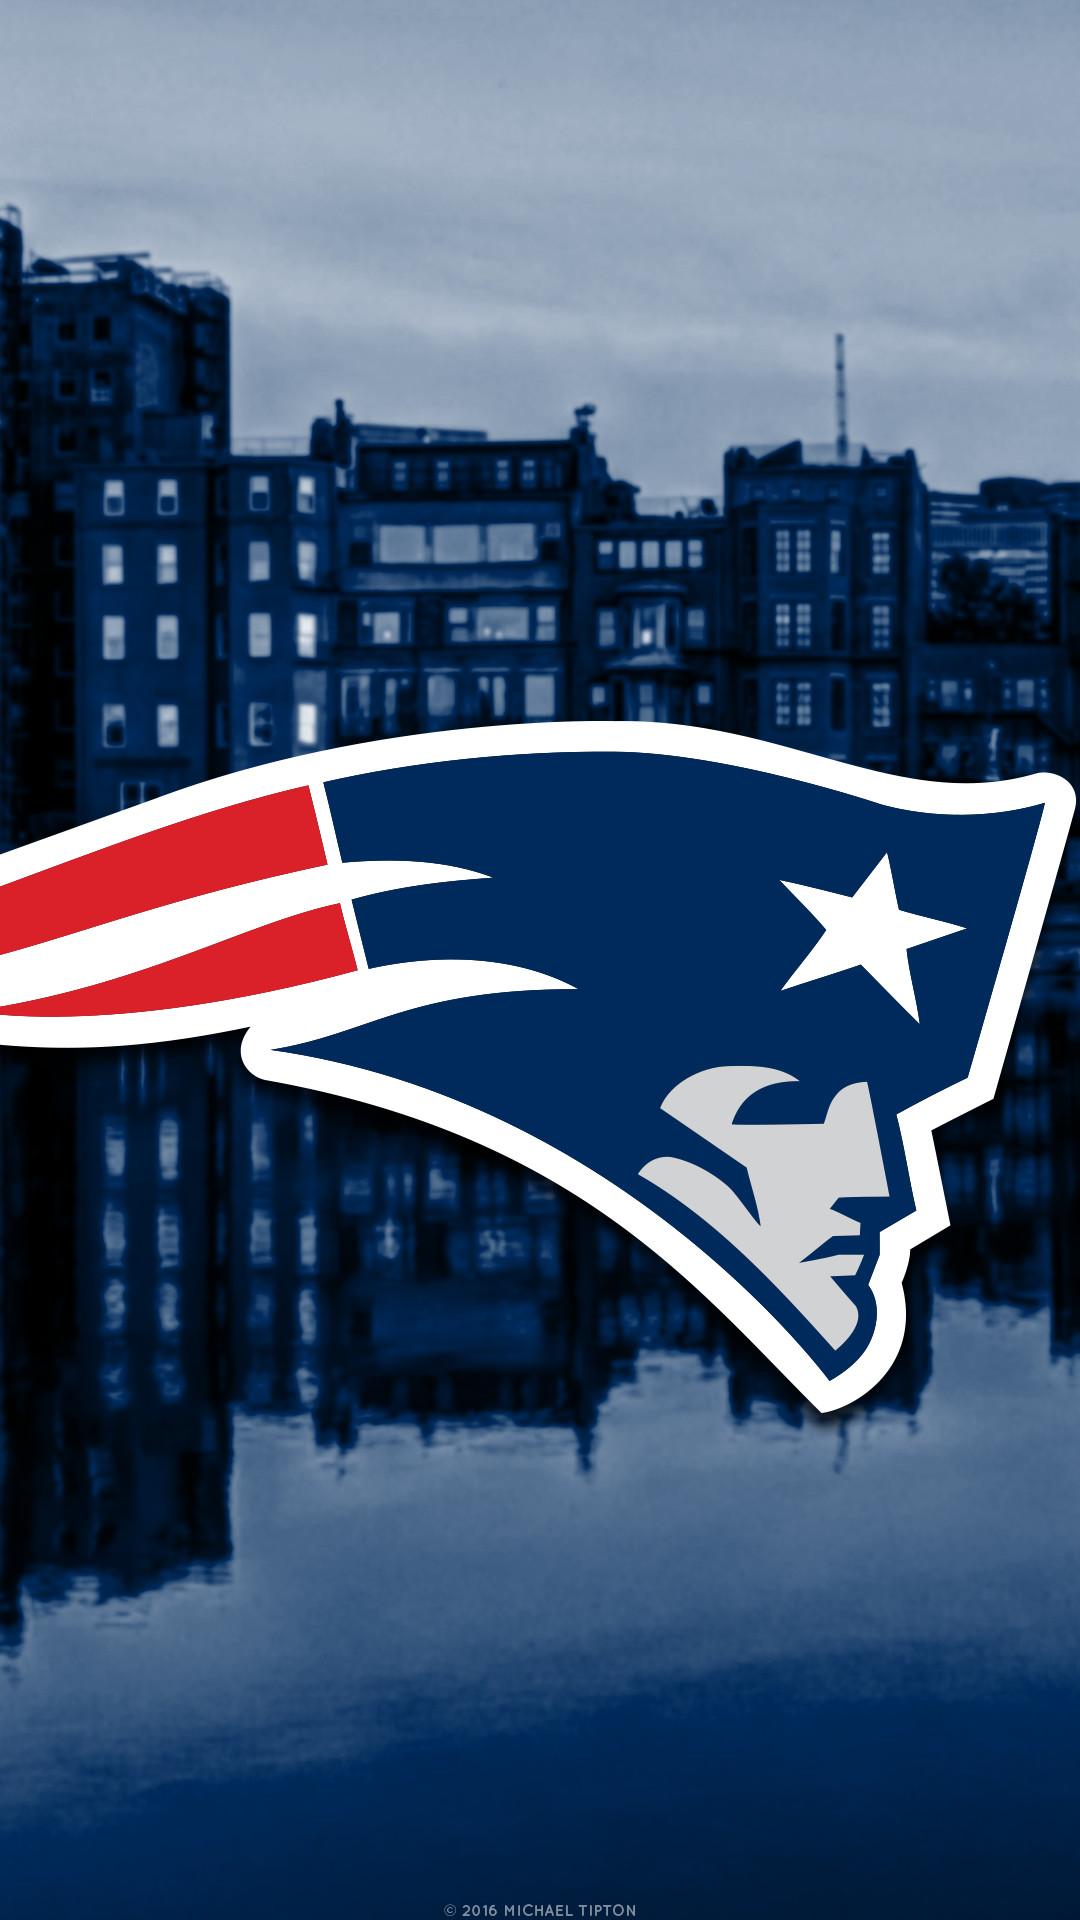 … New England Patriots city 2017 logo wallpaper free iphone 5, 6, 7,  galaxy